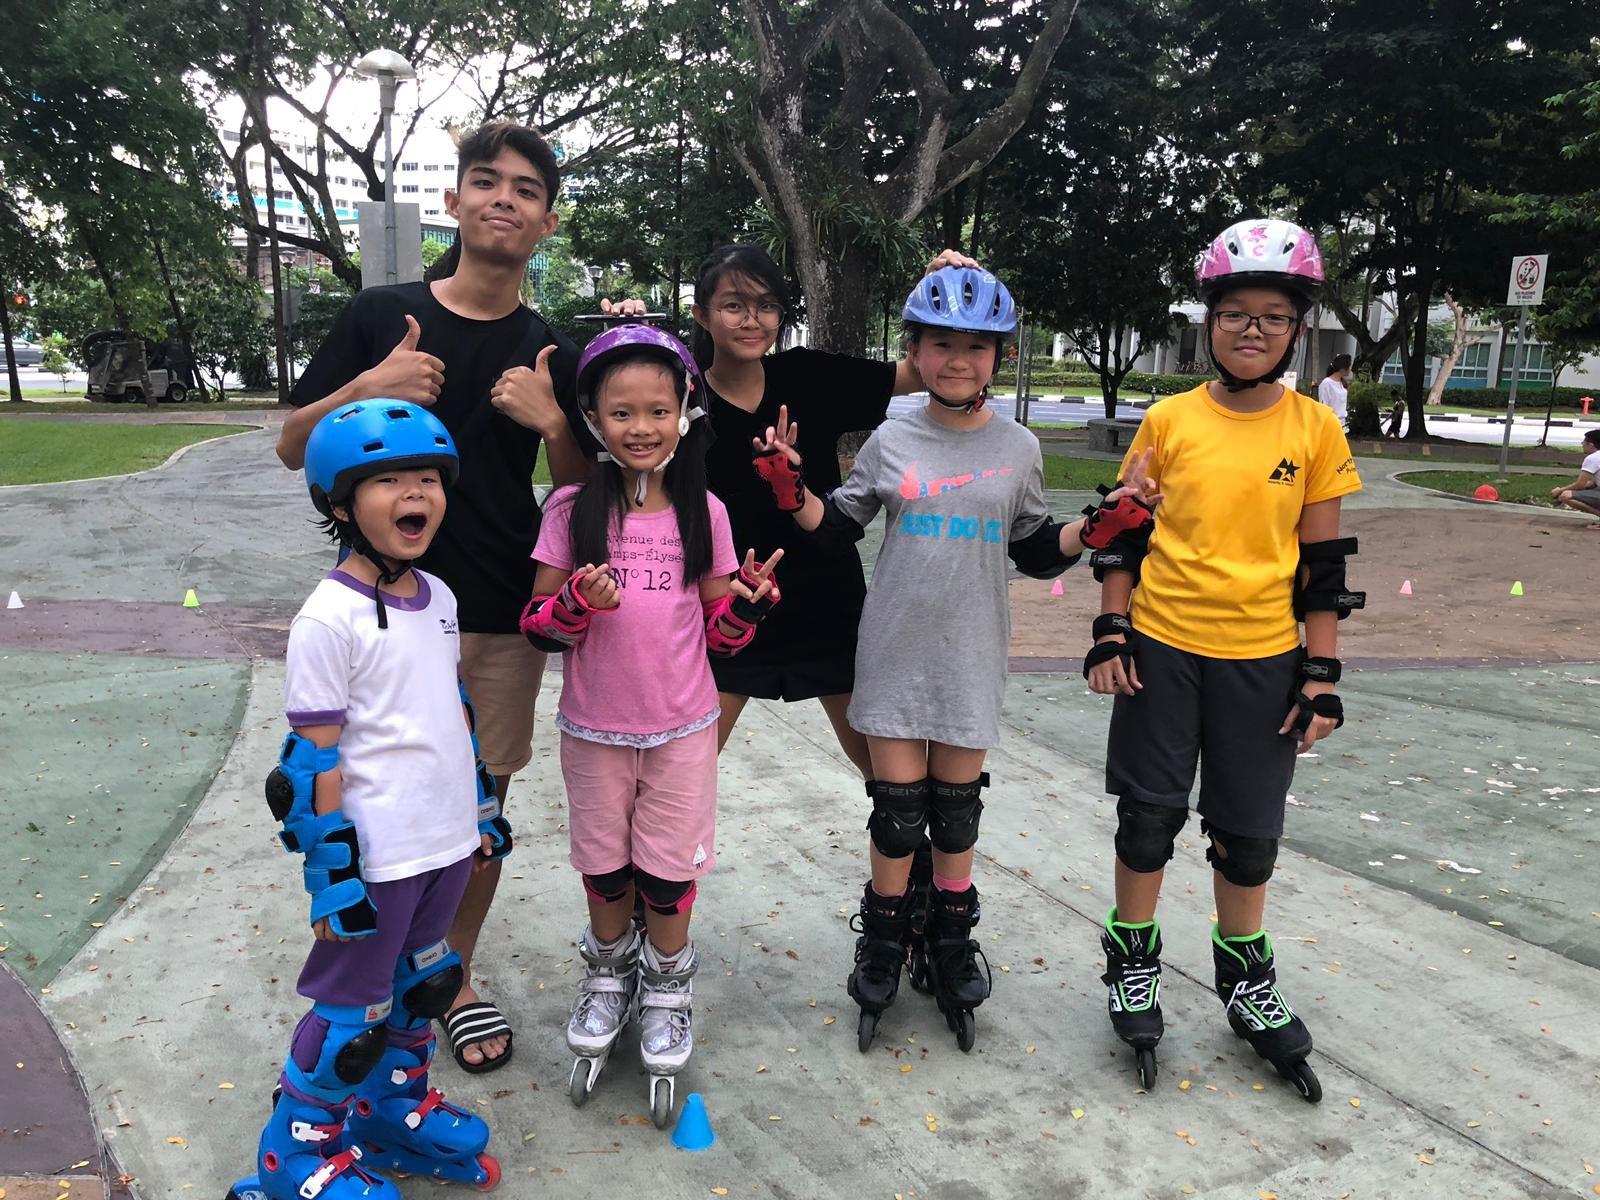 Yishun Park Skating Lesson Package